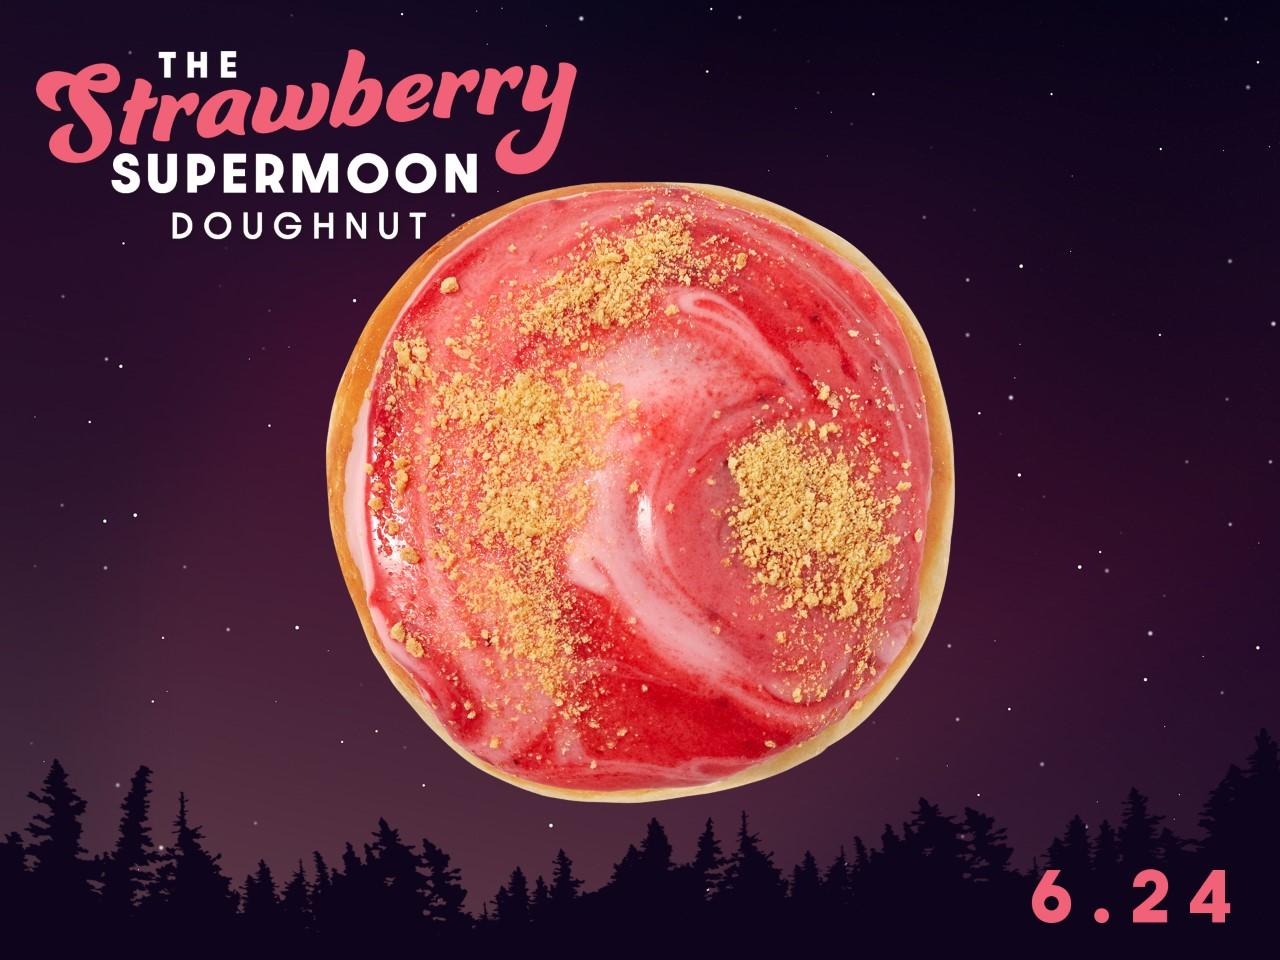 Krispy Kreme offers 1-day treat to enjoy during 'Strawberry' supermoon